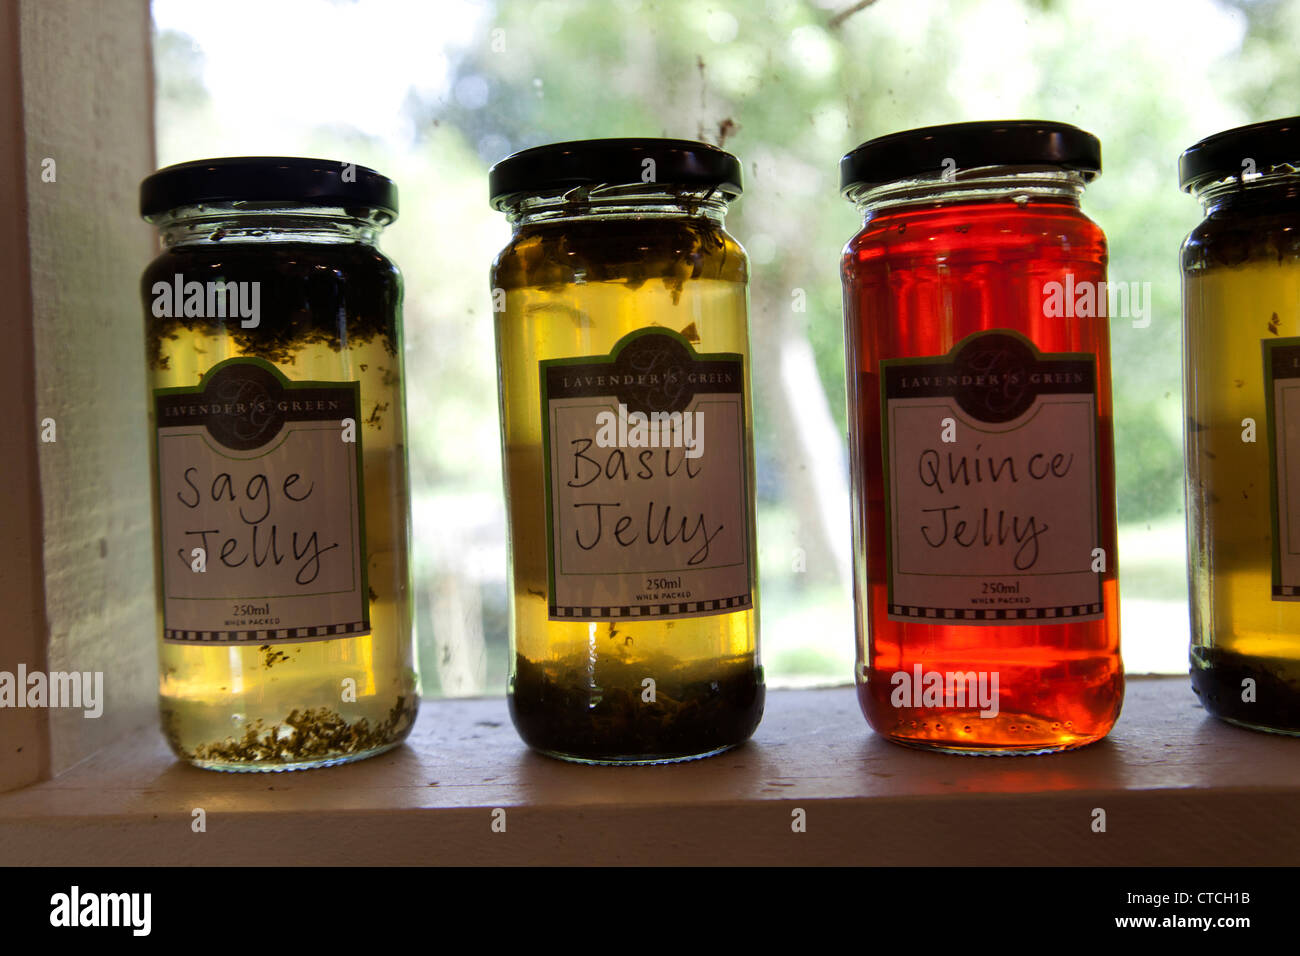 Jelly, Jam, Lavender's Green, Wairaparapa, North Island, New Zealand - Stock Image